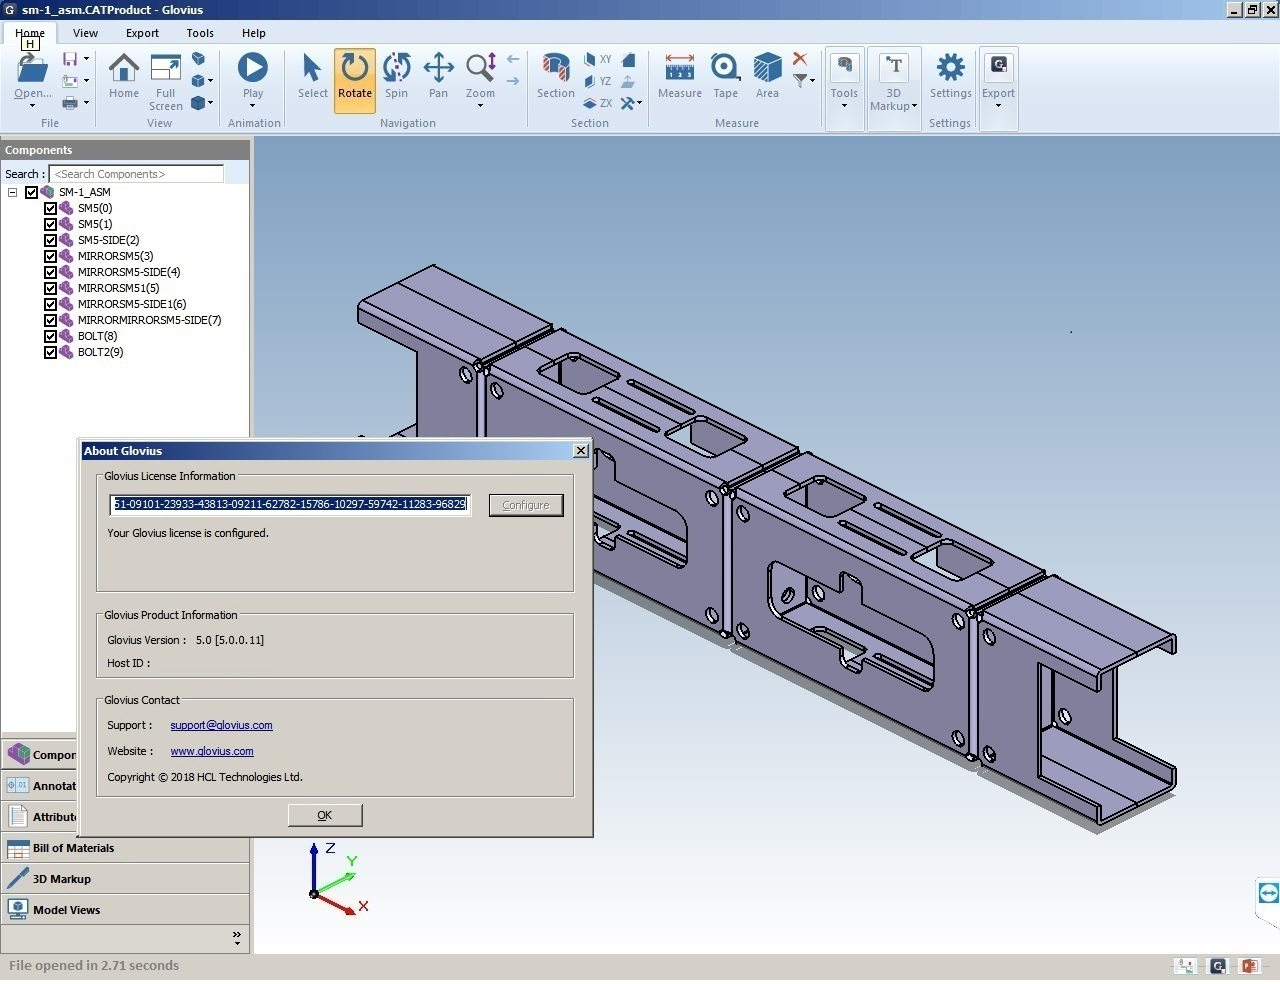 Working with Geometric Glovius Pro v5.0.0.1 full license